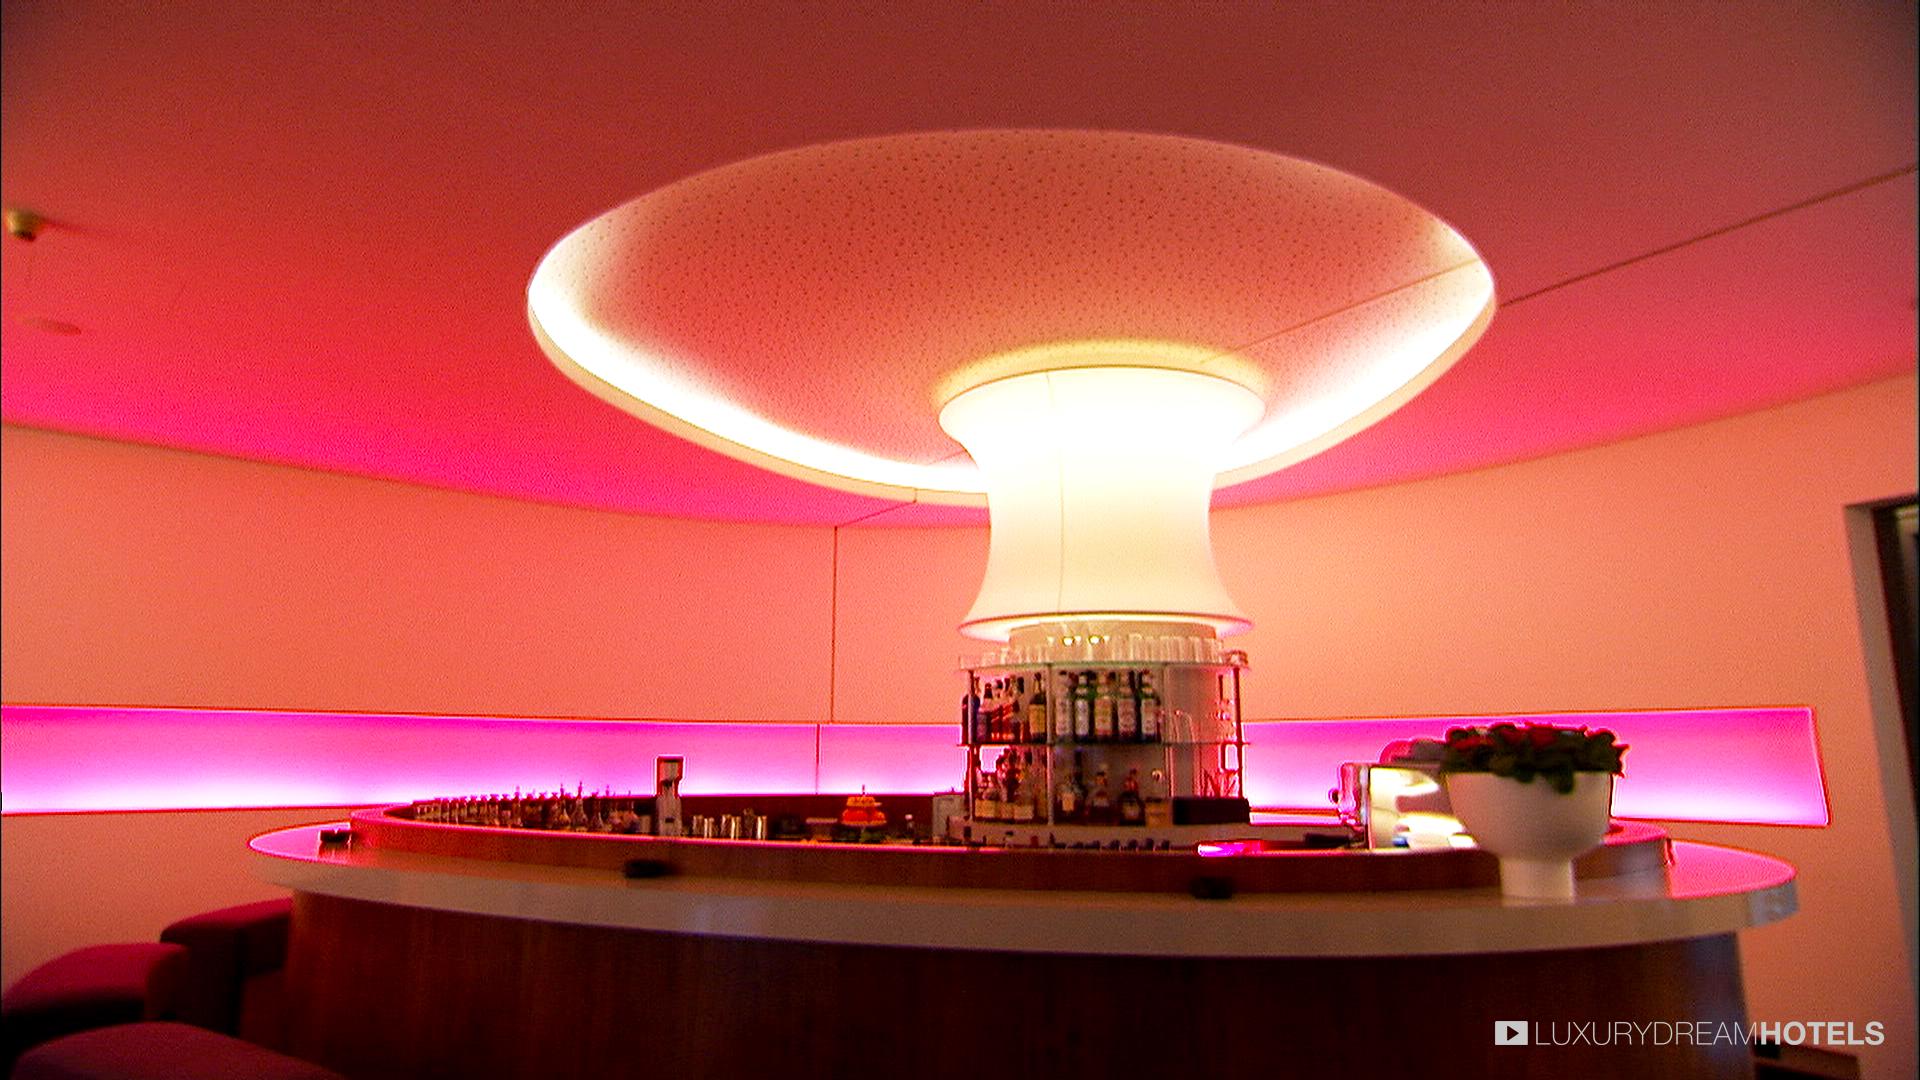 Damm Design luxury hotel ku damm 101 berlin germany luxury hotels